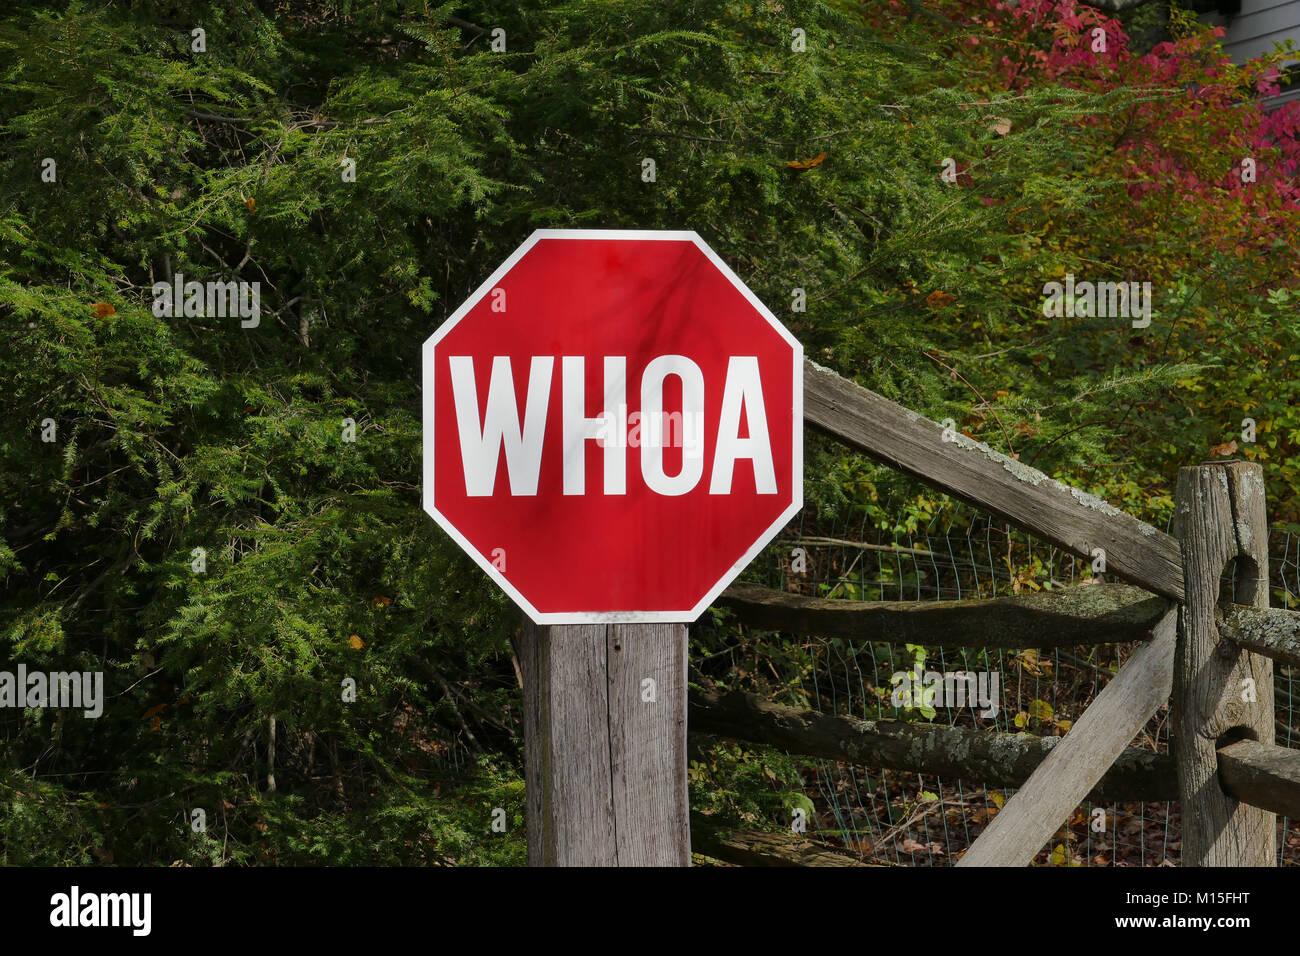 Whoa Stock Photo